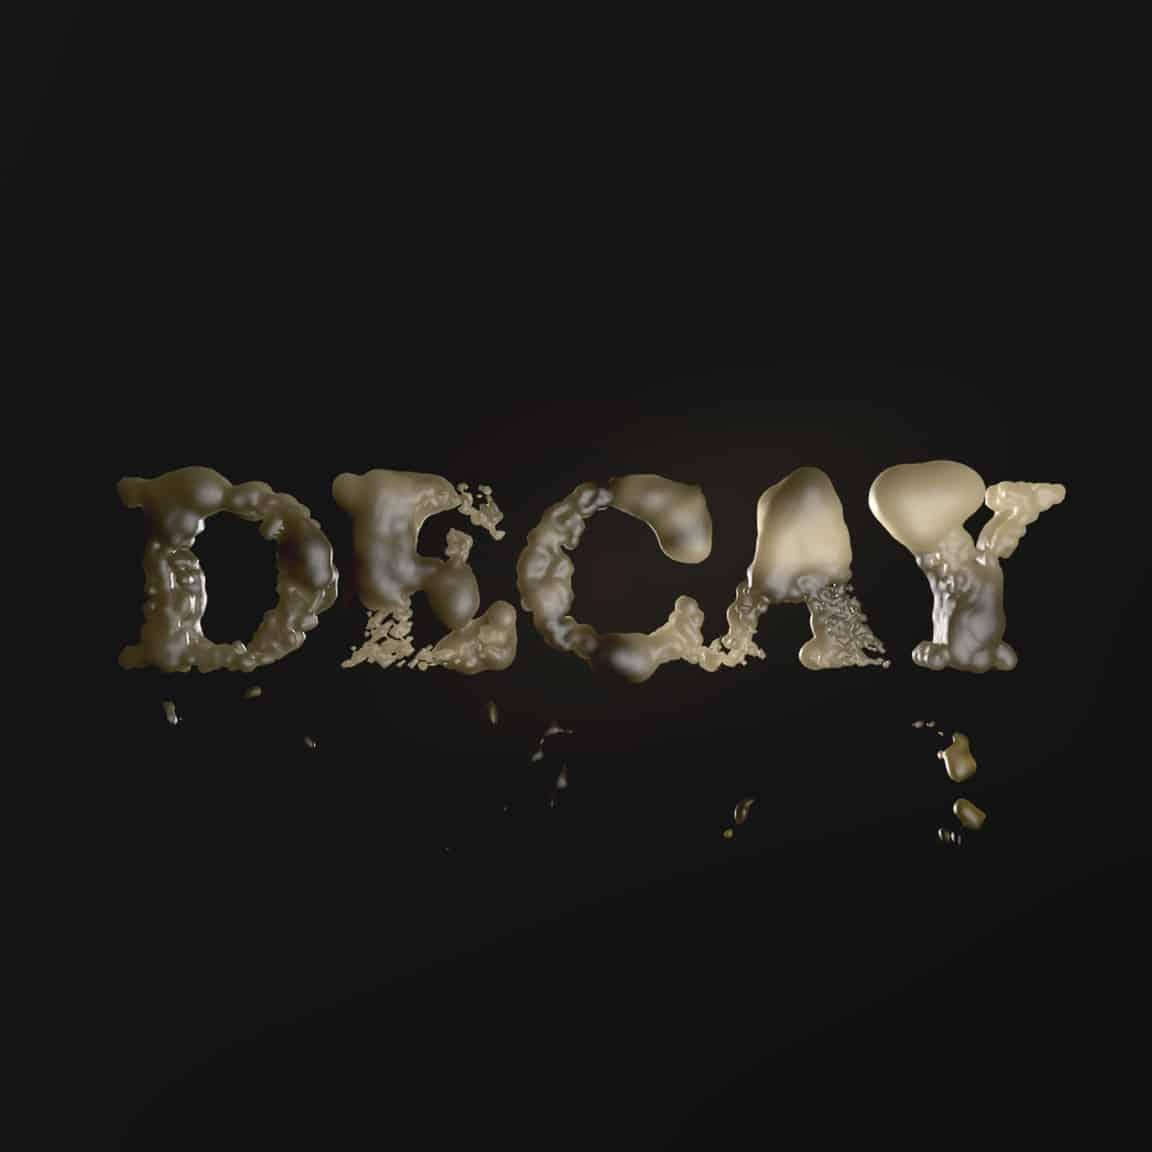 decay2.jpg